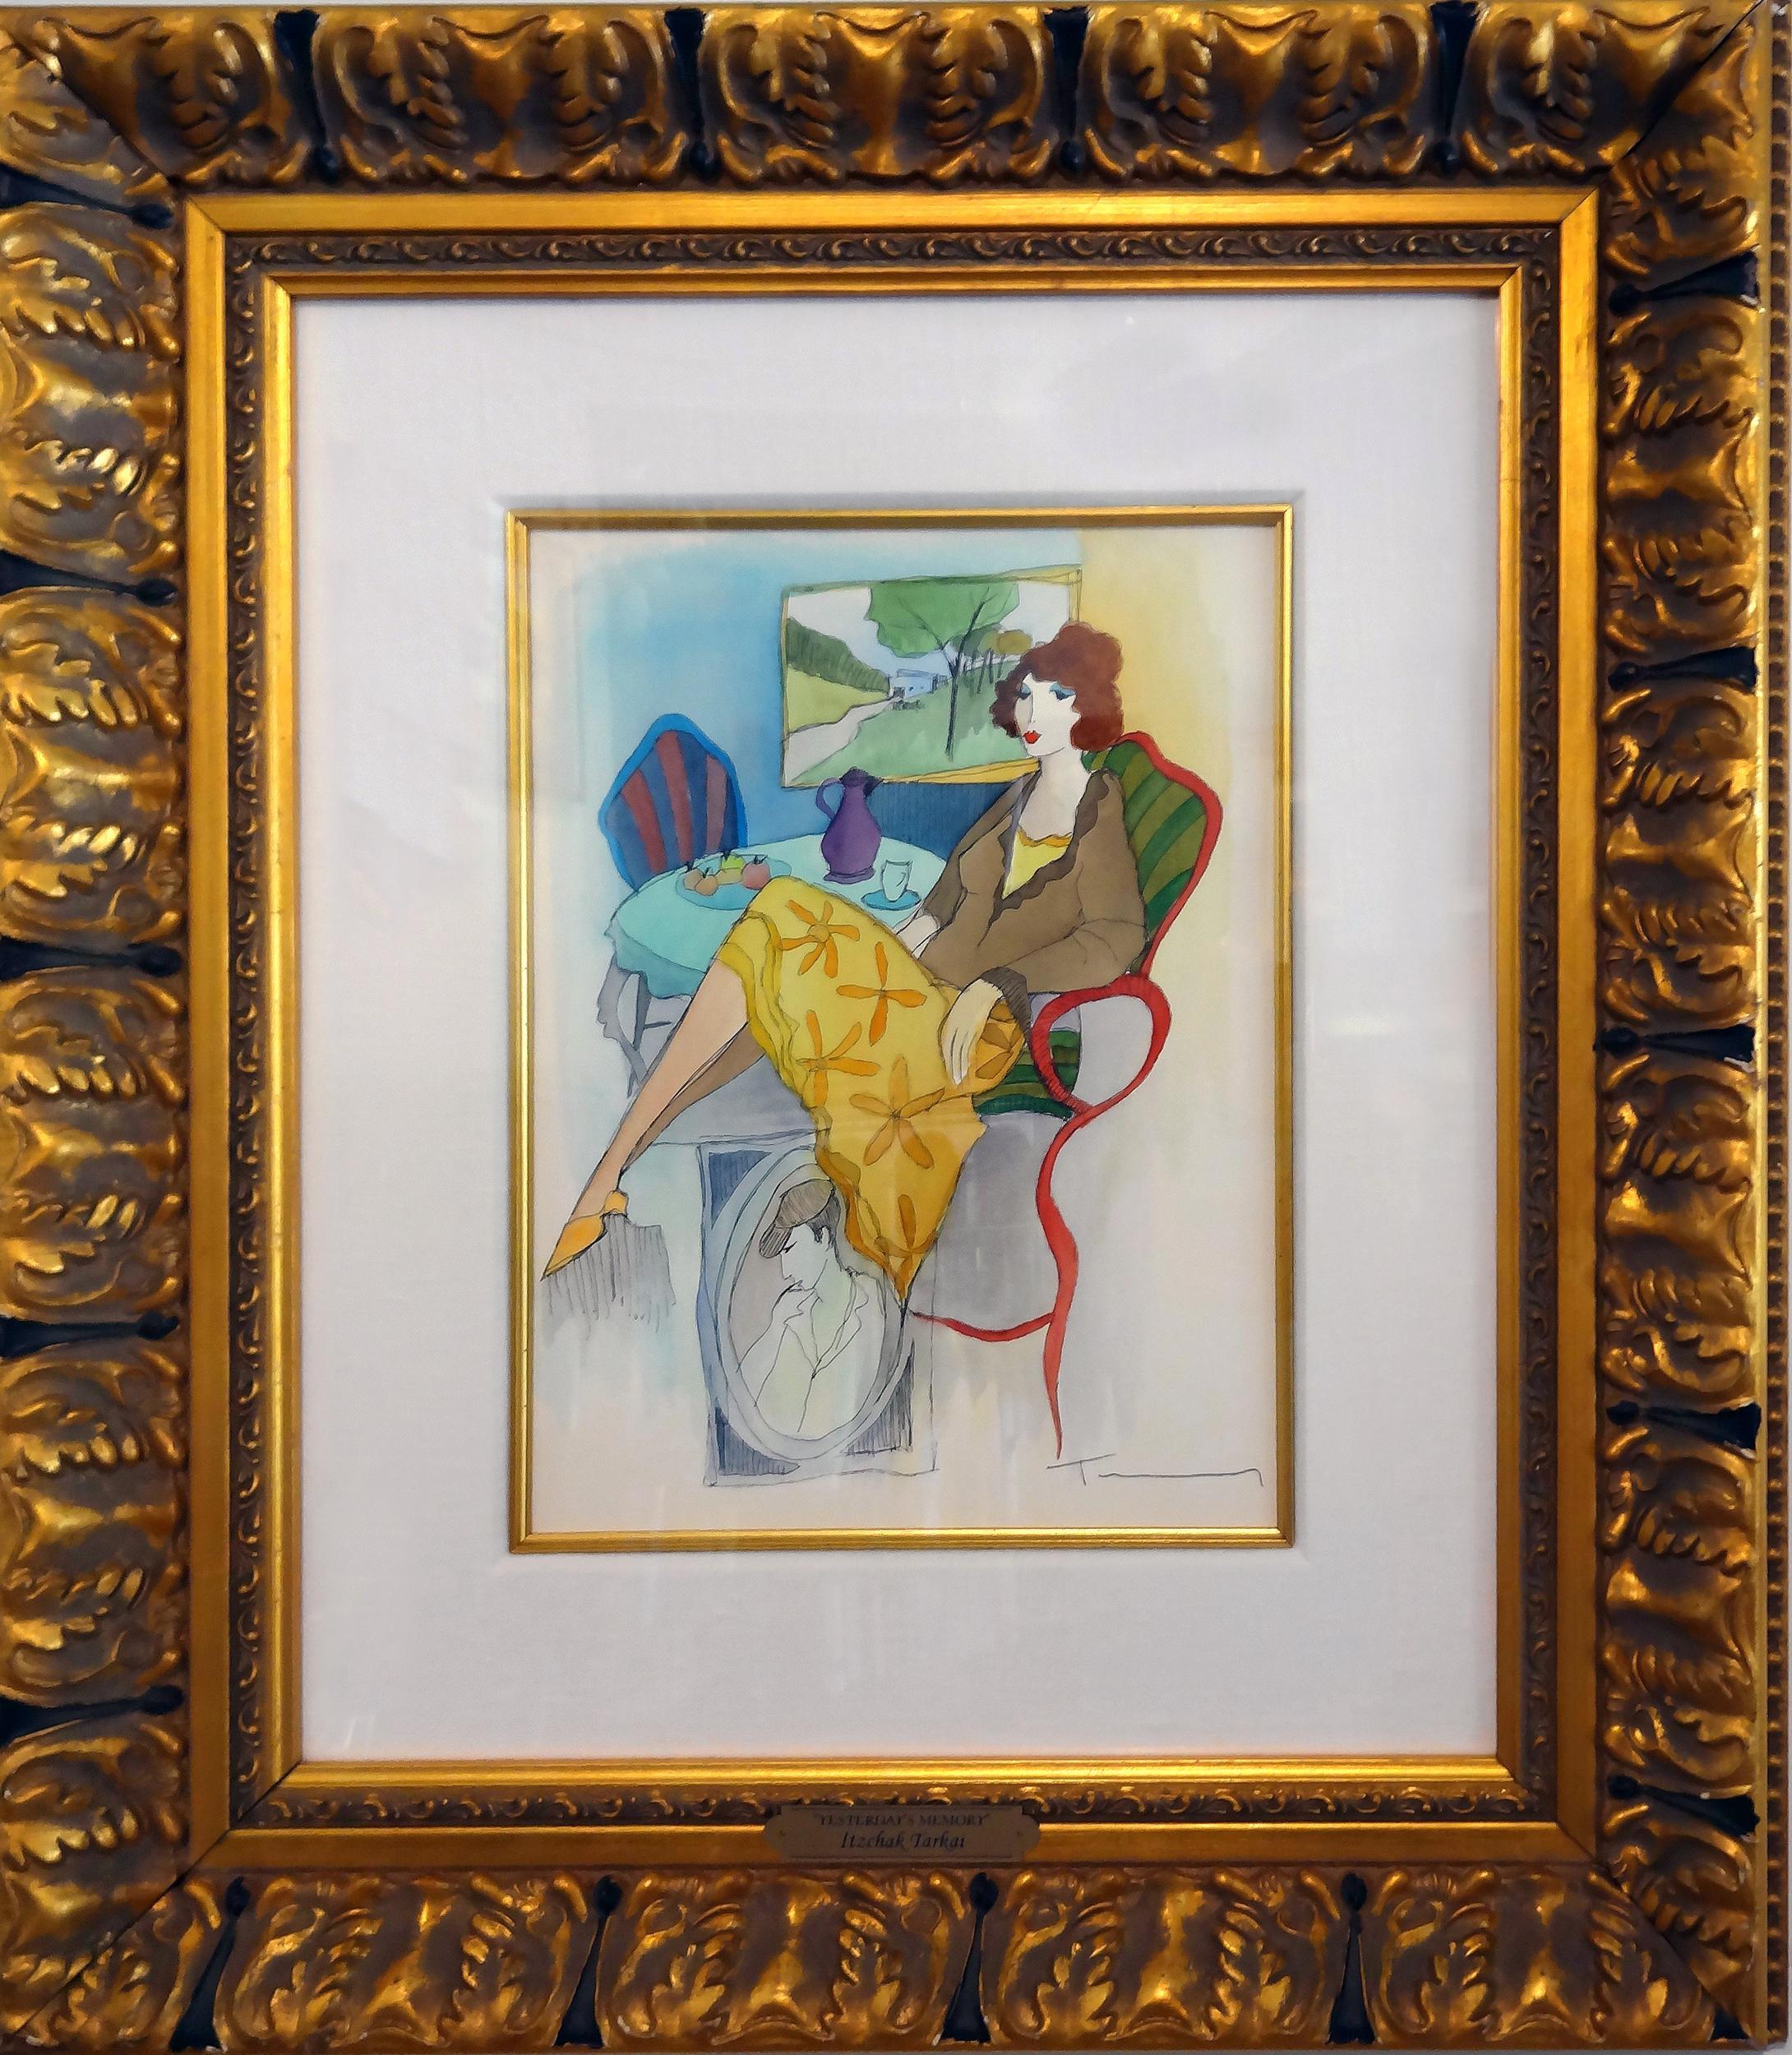 Itzchak Tarkay, Yesterday's Memory, Watercolor Painting